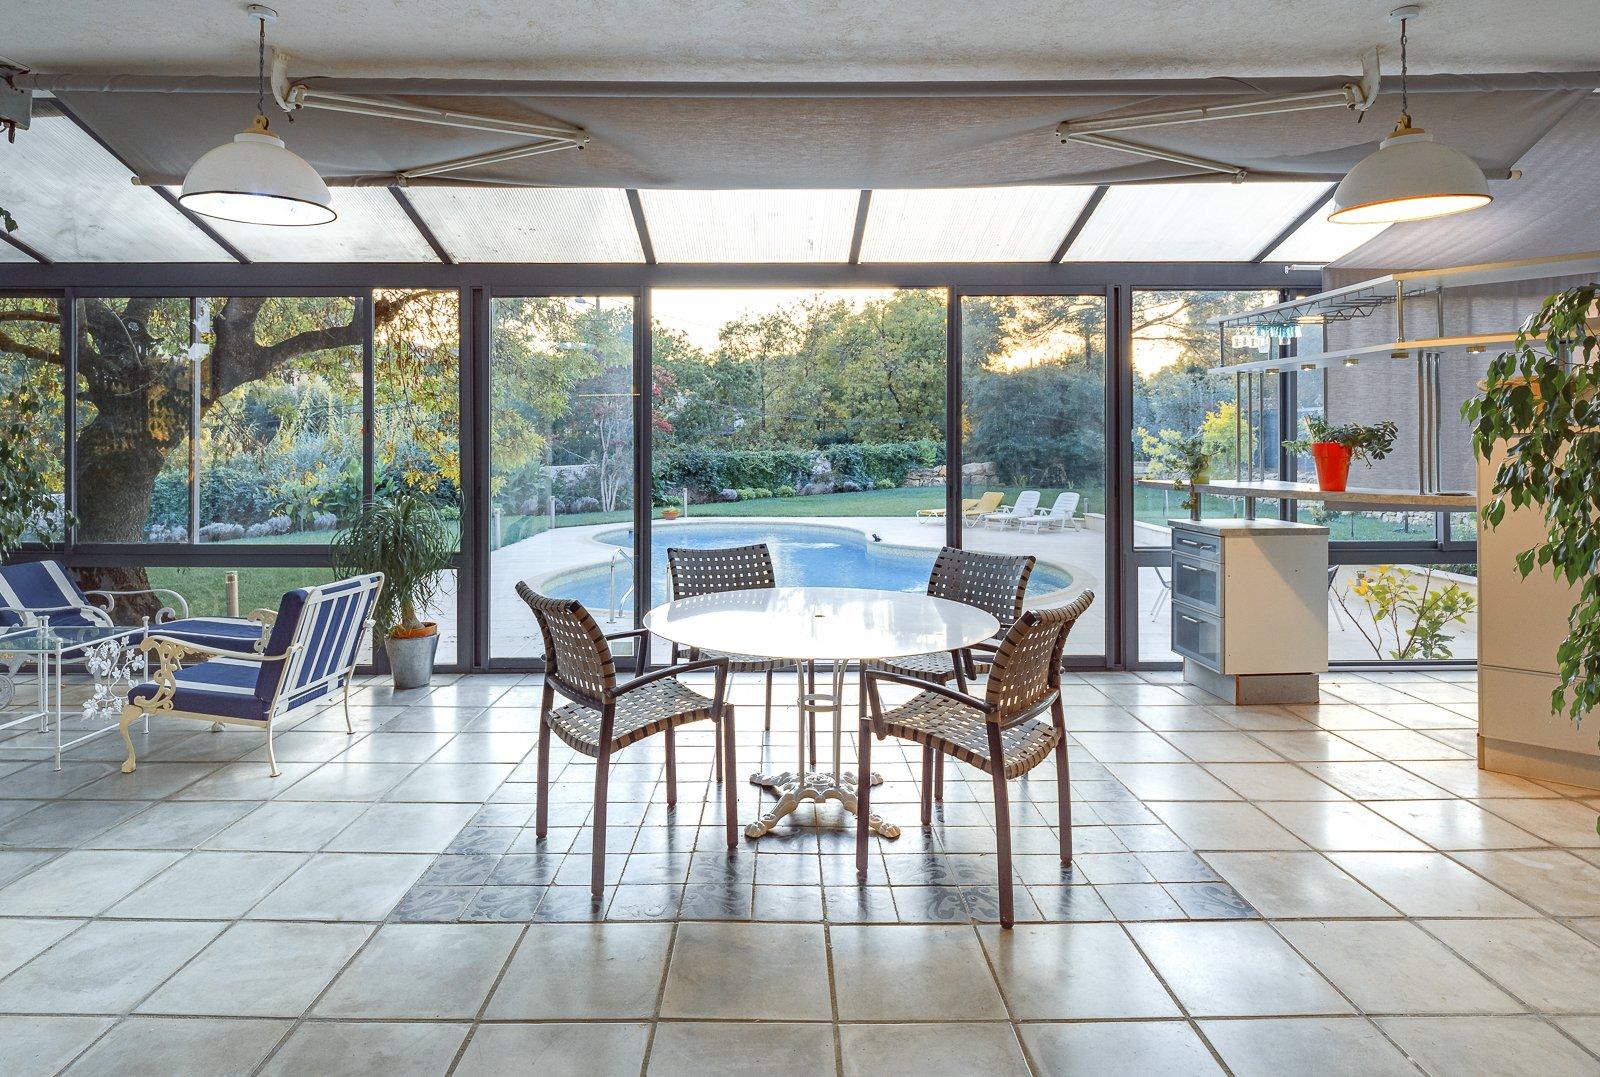 VALBONNE : family villa close to international schools